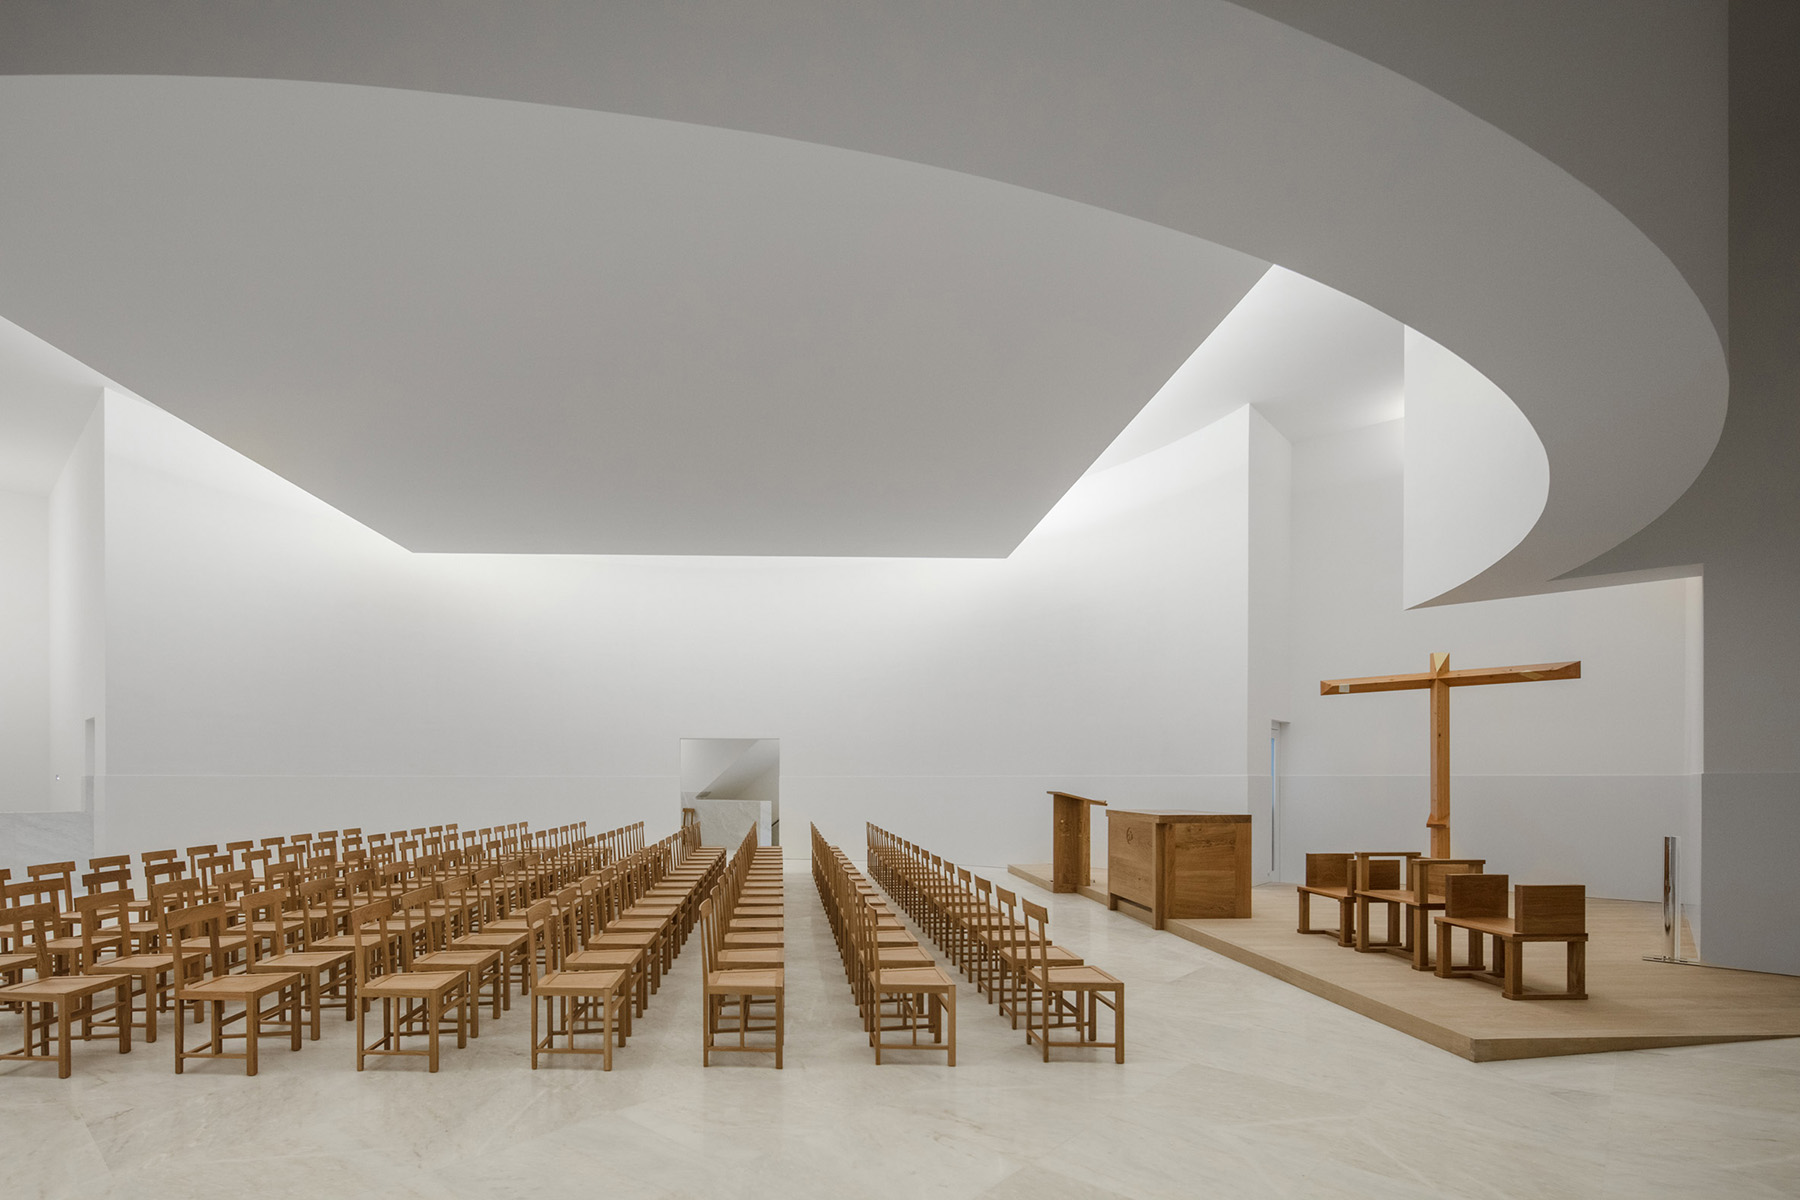 archaic_alvarosiza_church_6.jpg